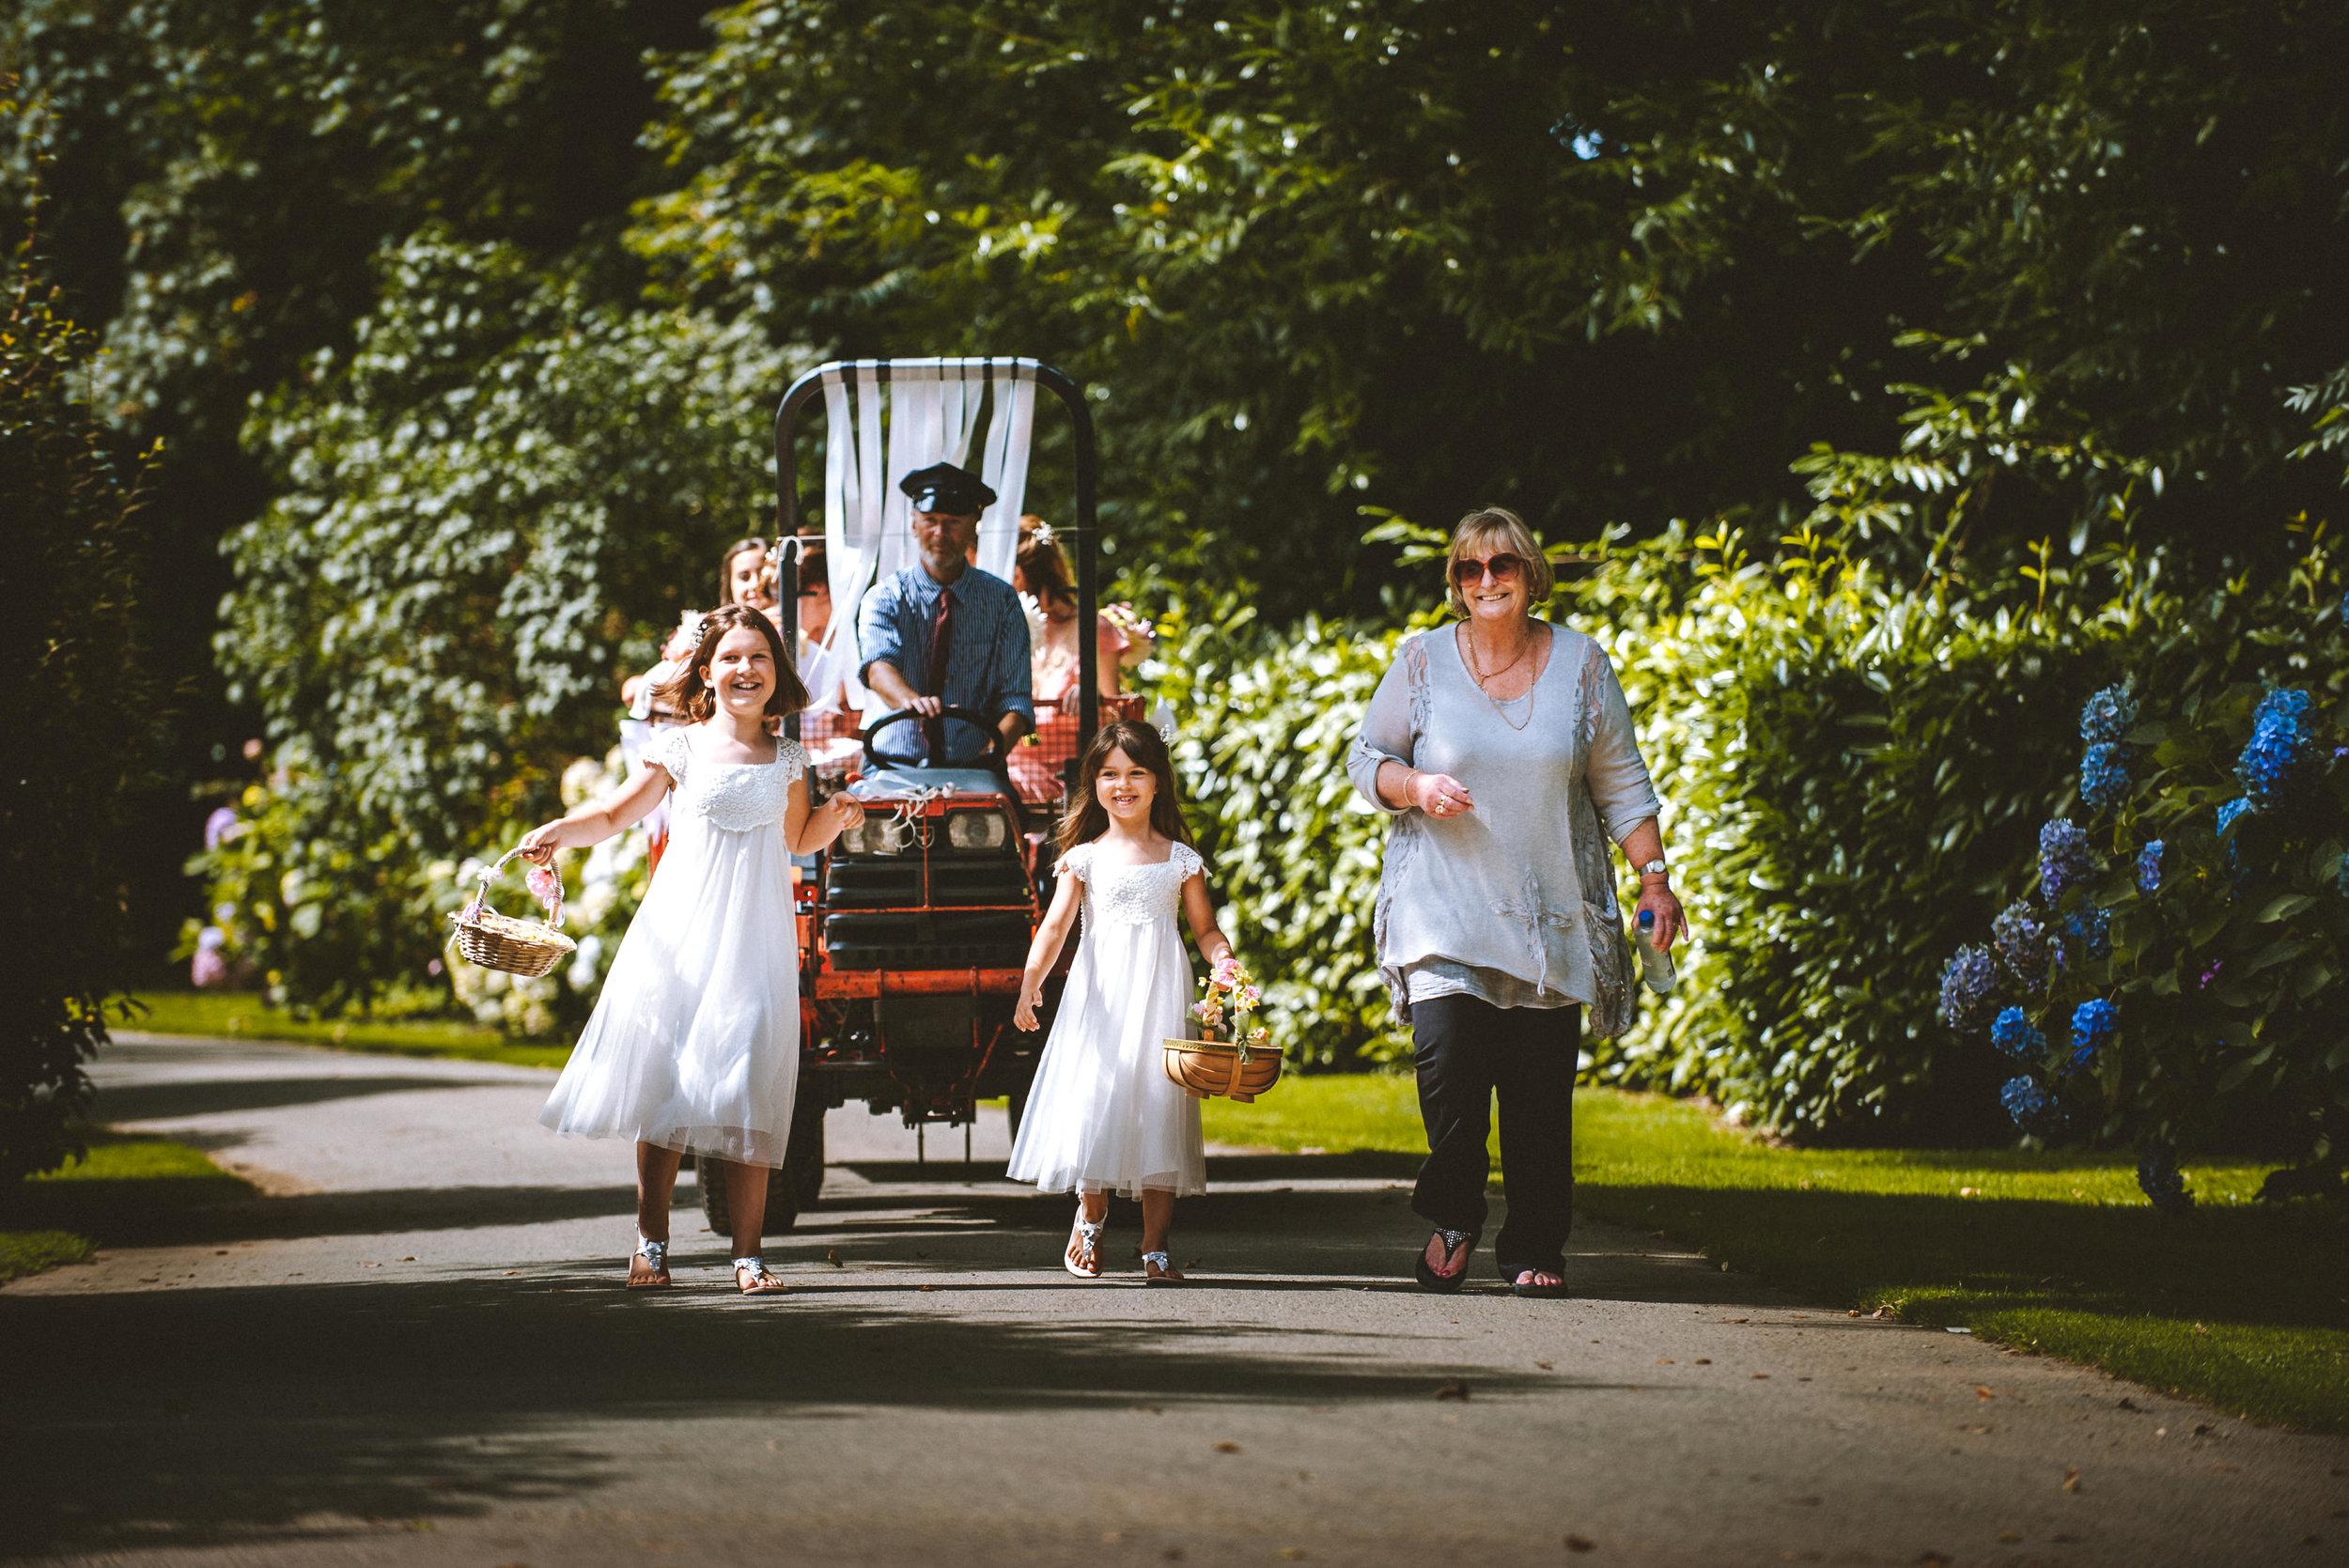 pencarrow-house-wedding-photographer-39.jpg